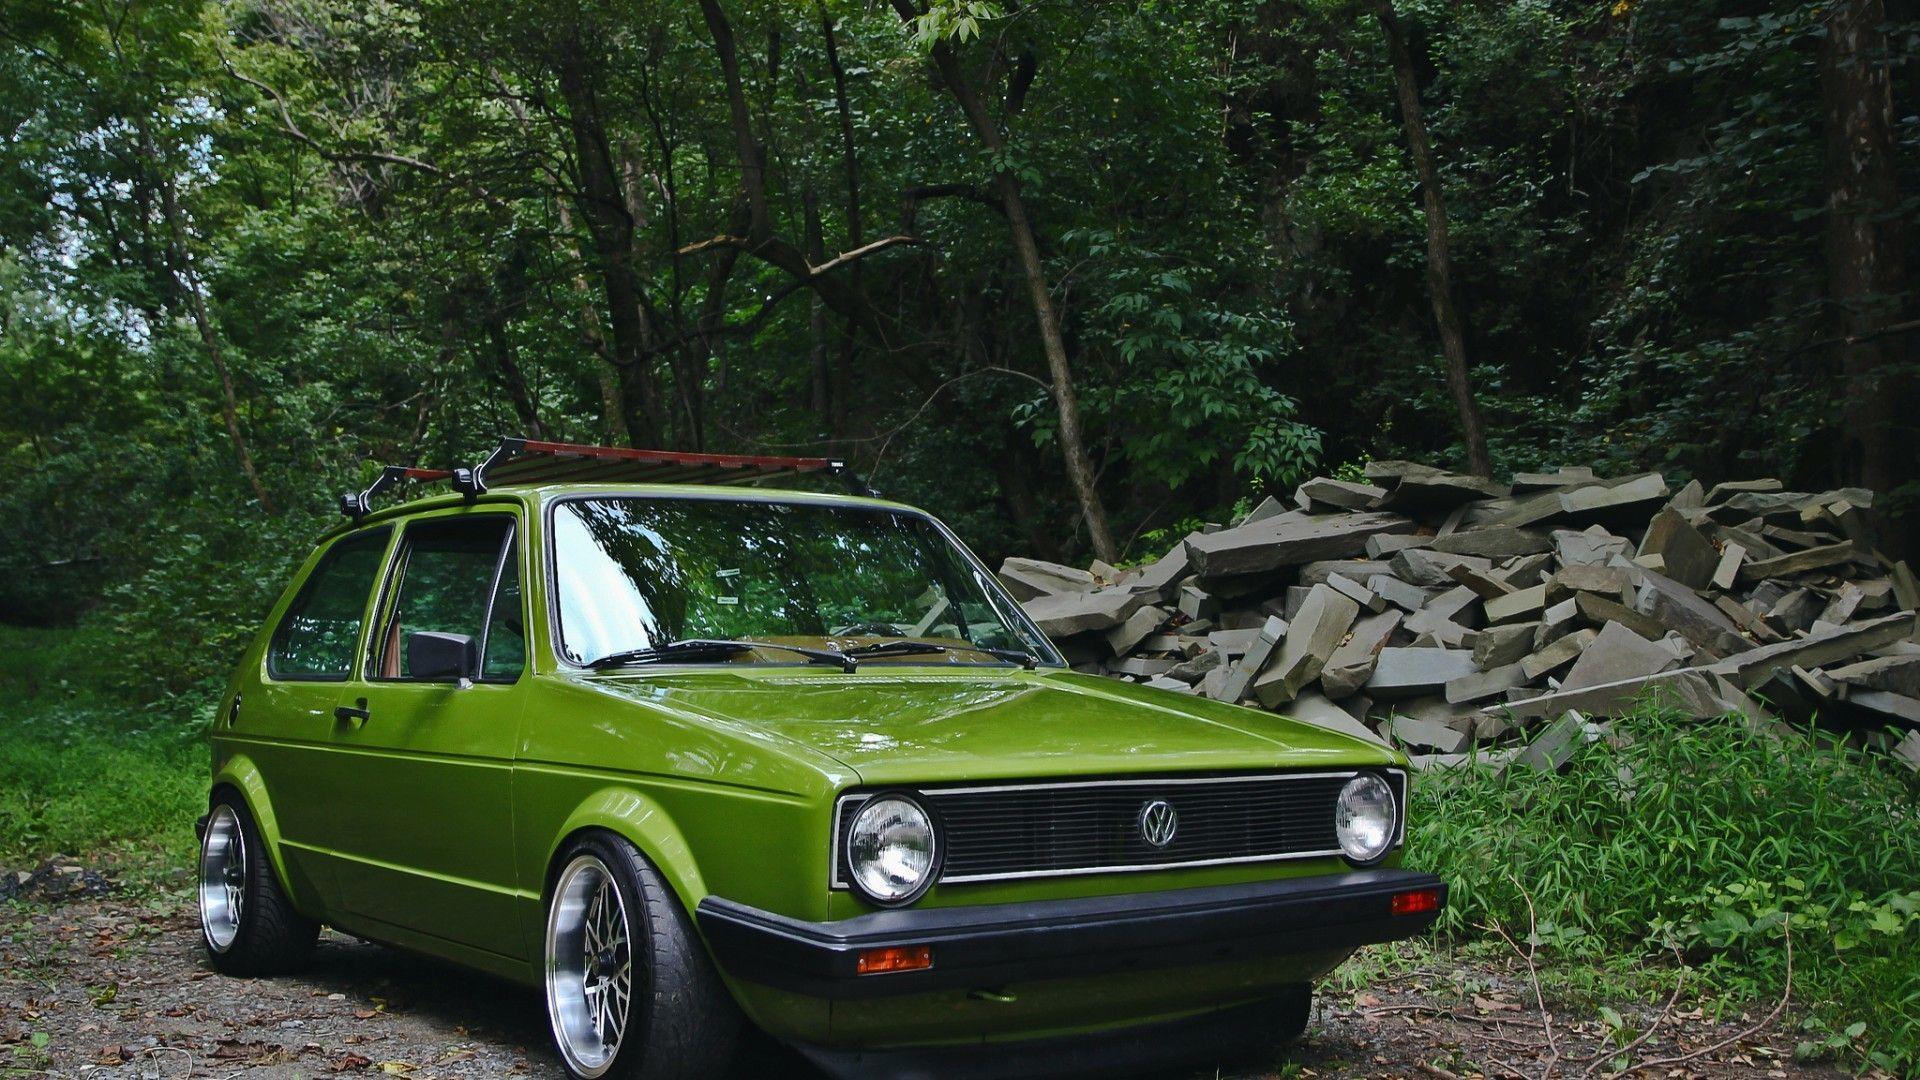 Vw 1 K Golf Car Wallpaper Volkswagen Vw 1 K Golf Wallpapers My